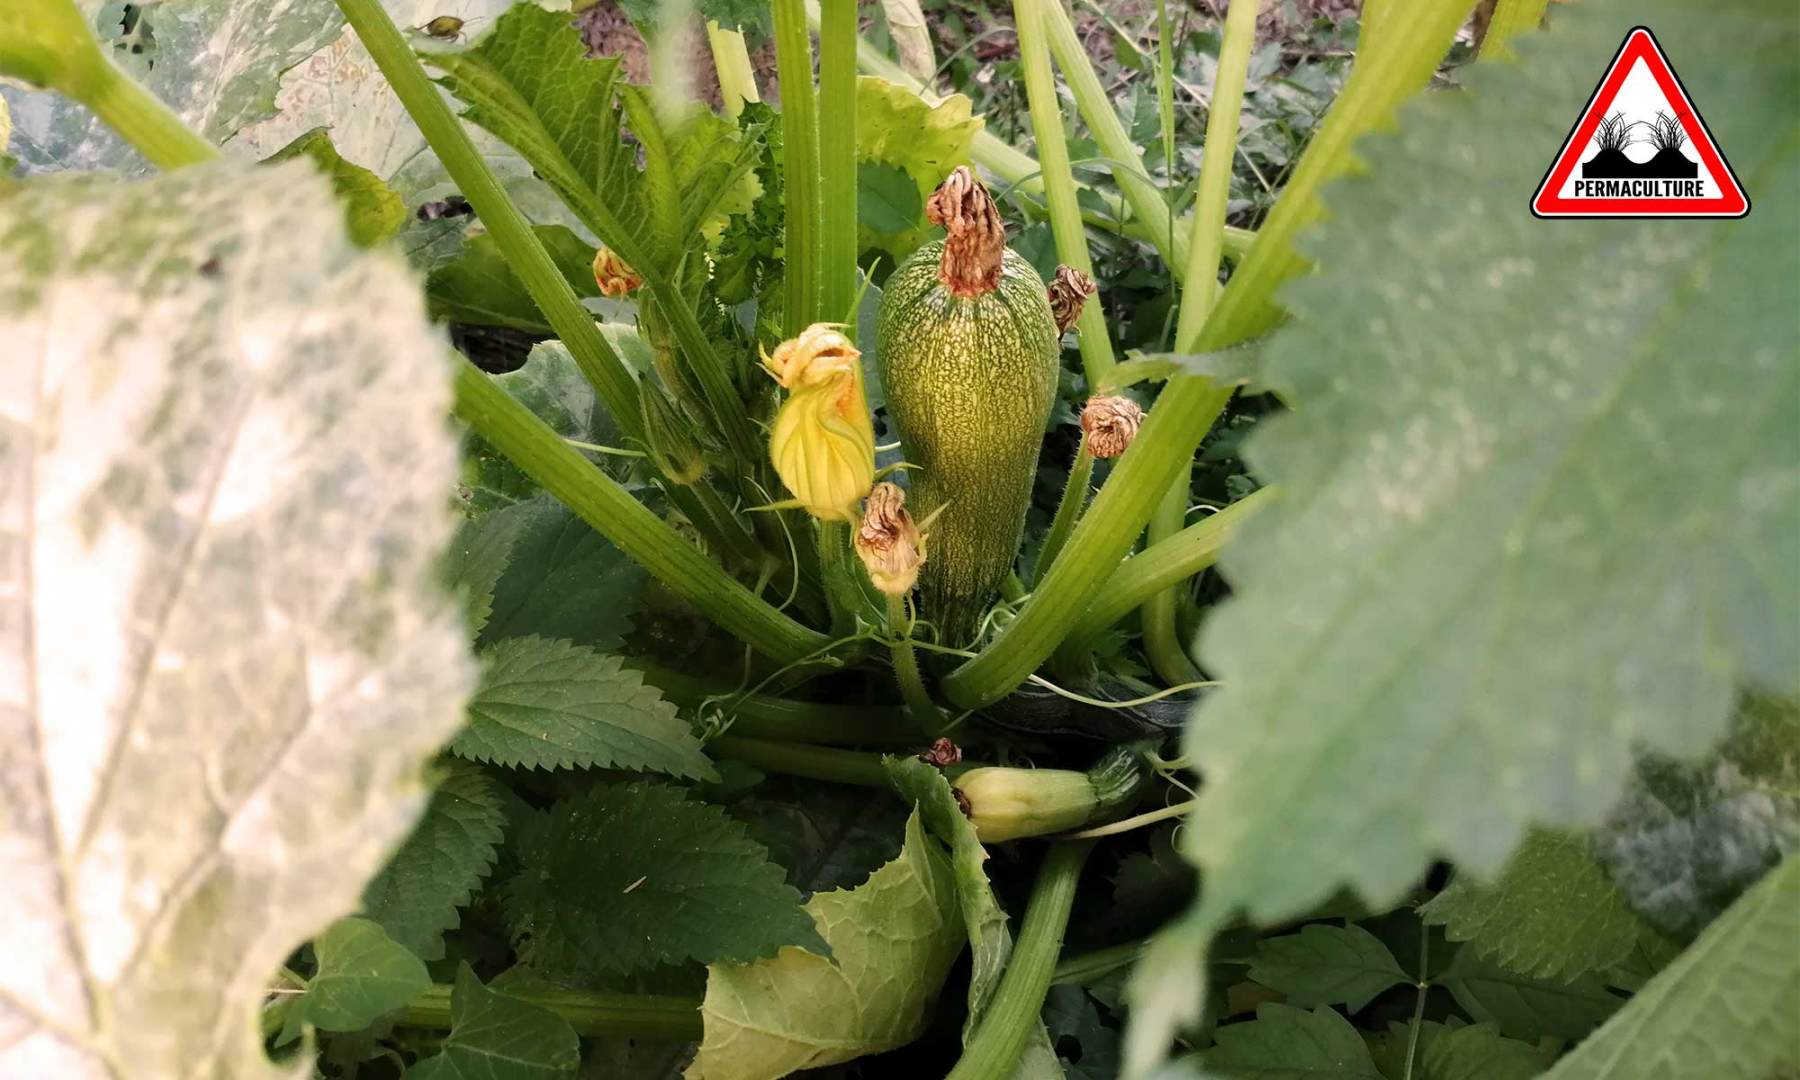 cougette-jardin-lasagne-baugnac